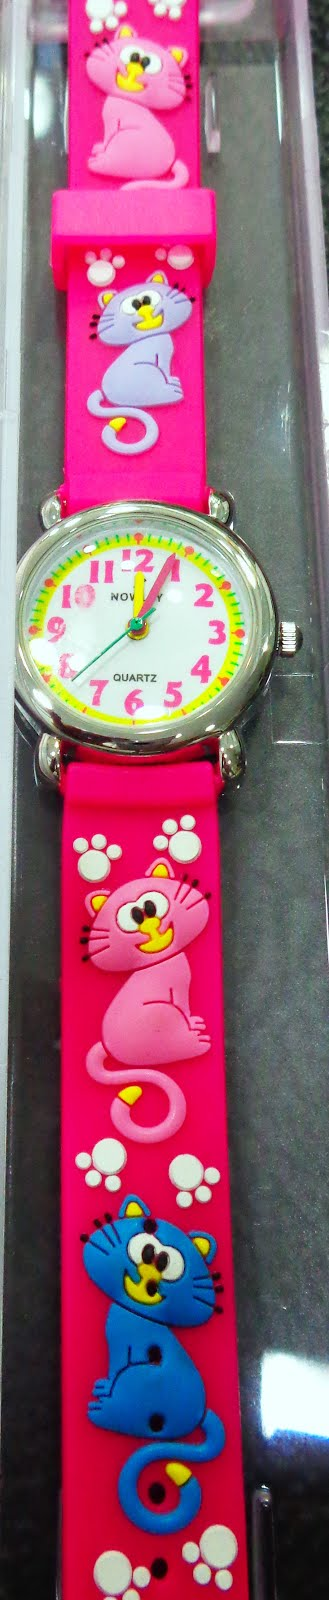 Reloj infantil Nowley 19,90